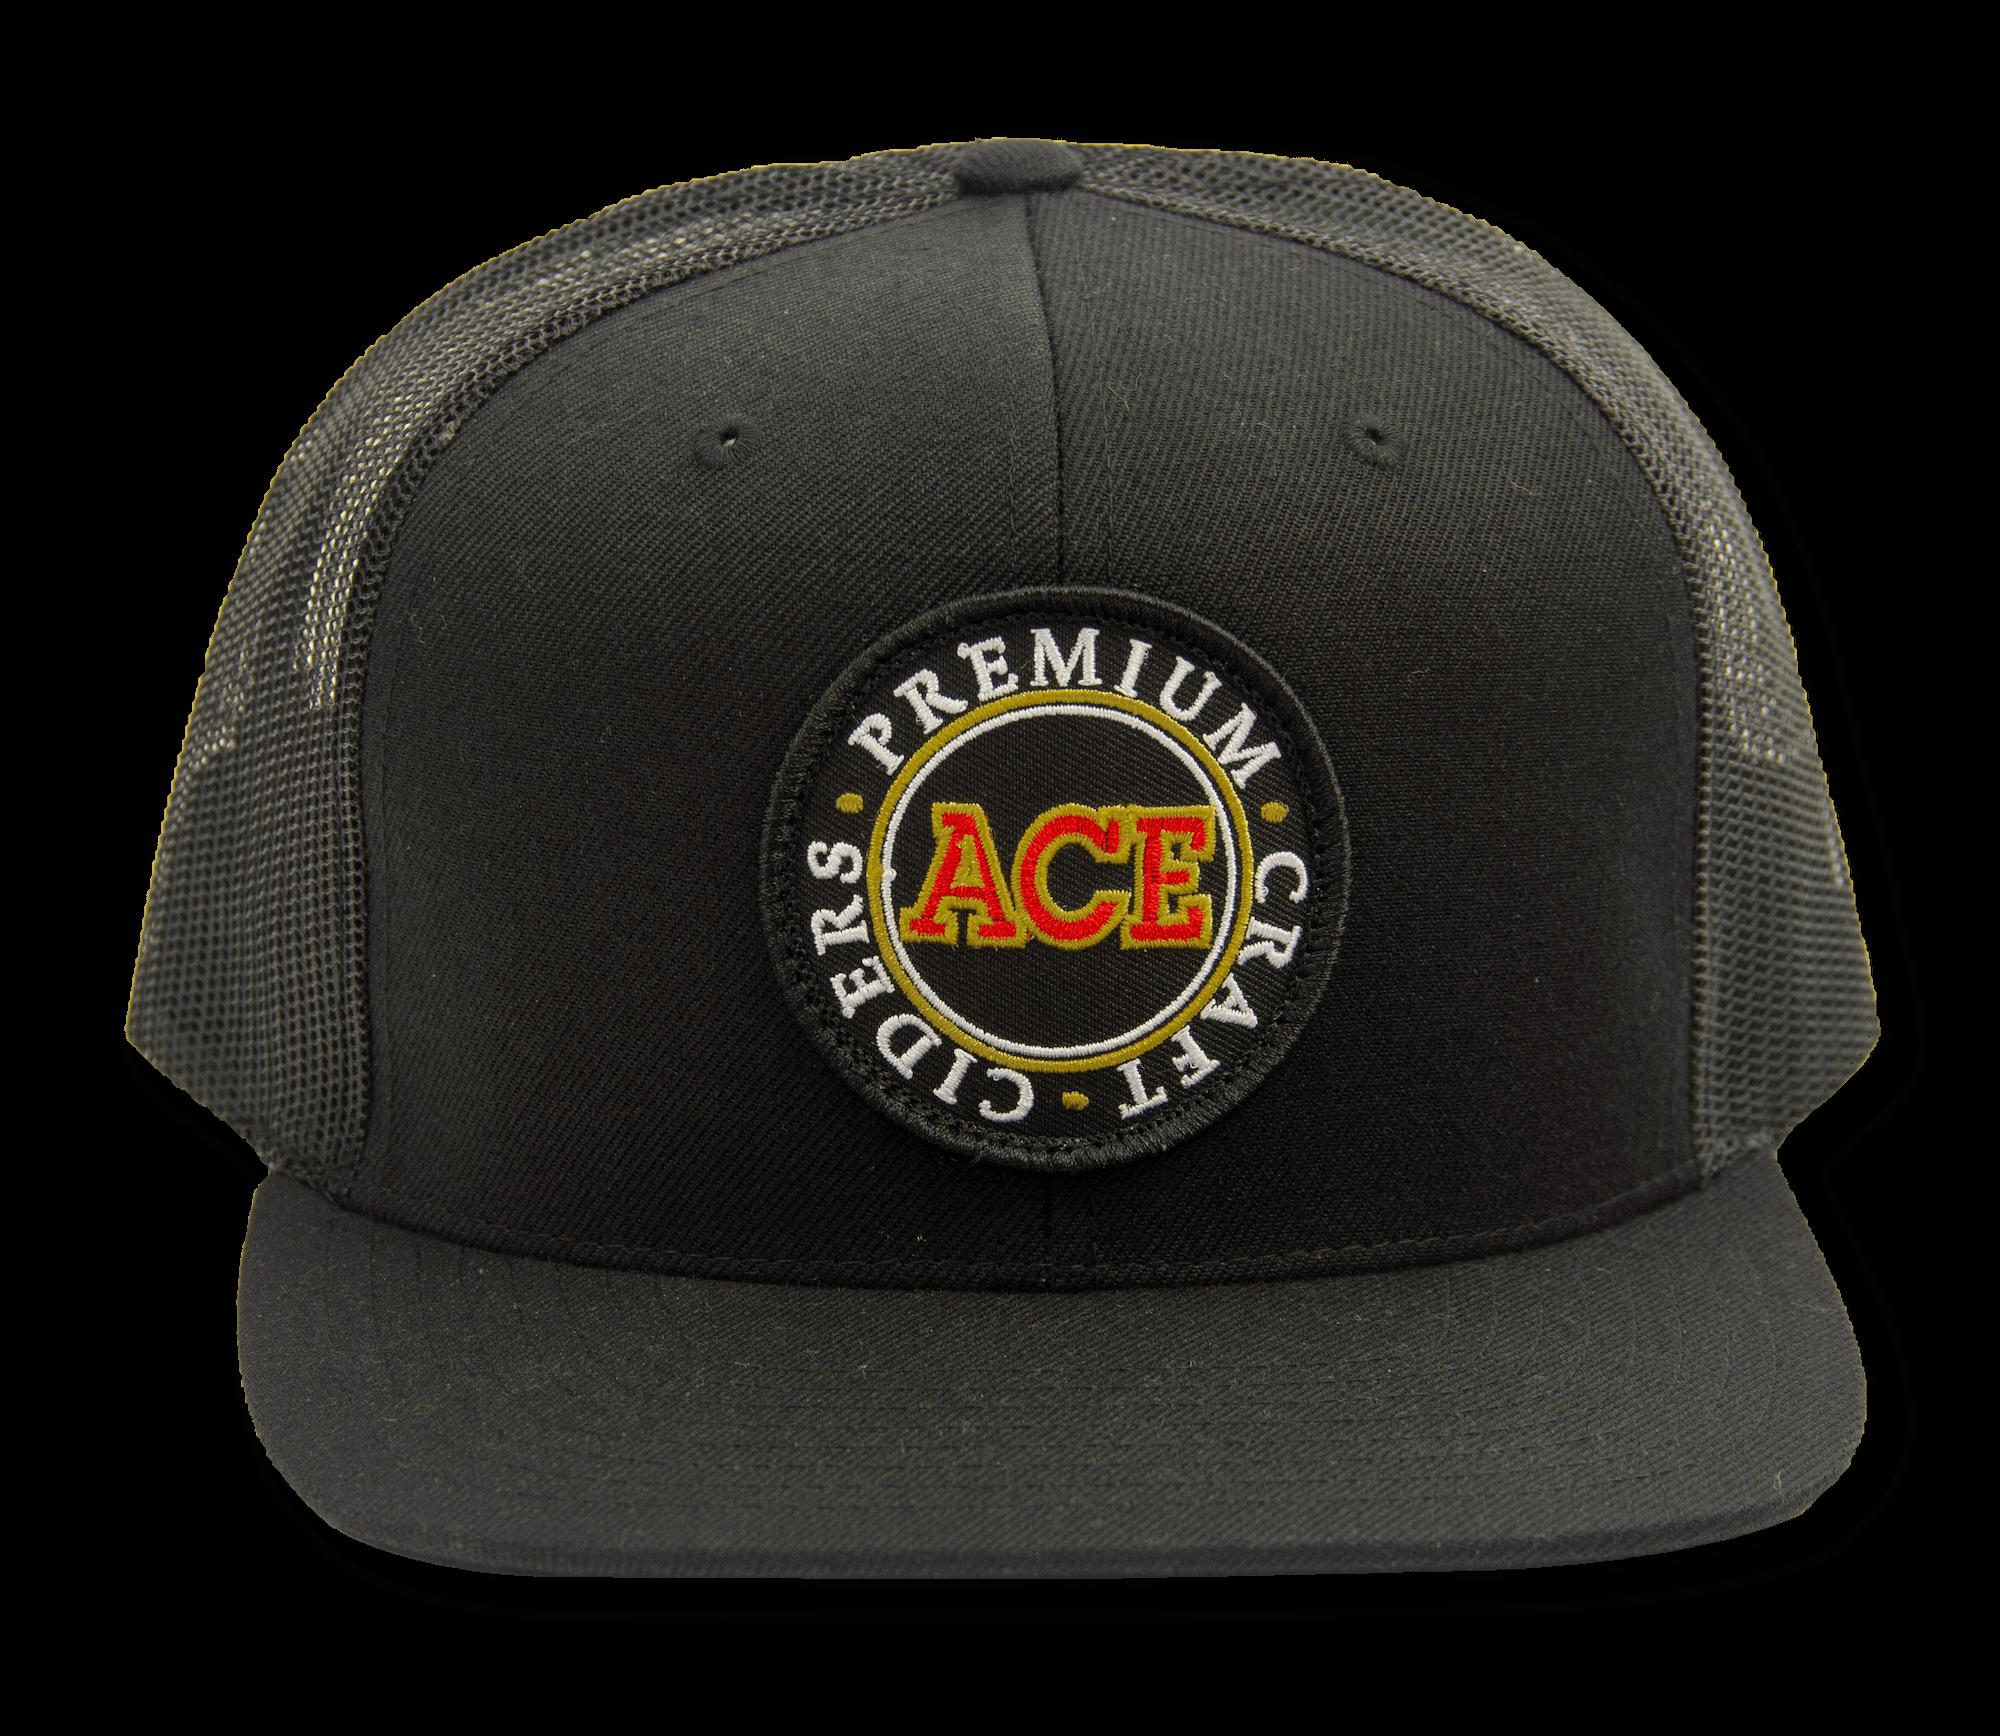 ACE Cider Men's Baseball Cap